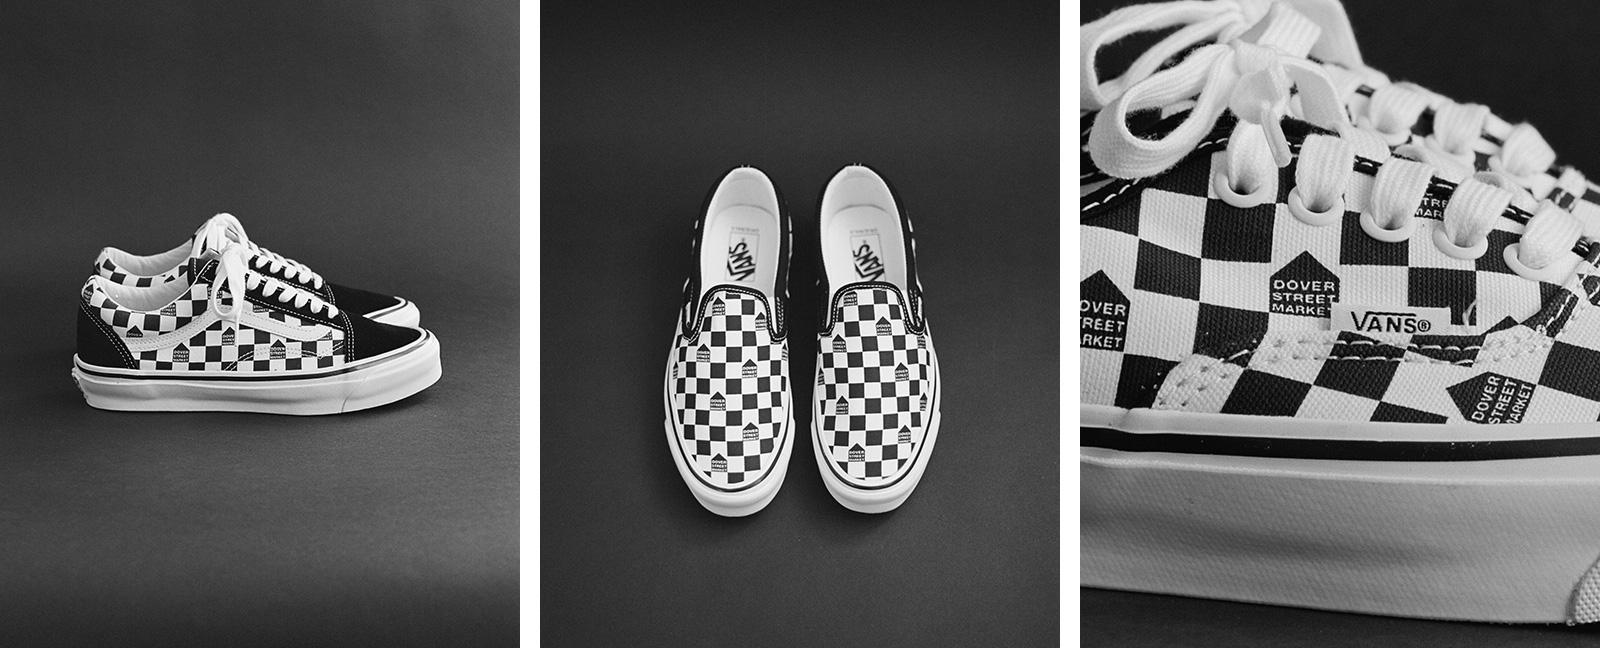 Vans x DSM Checkerboard Specials